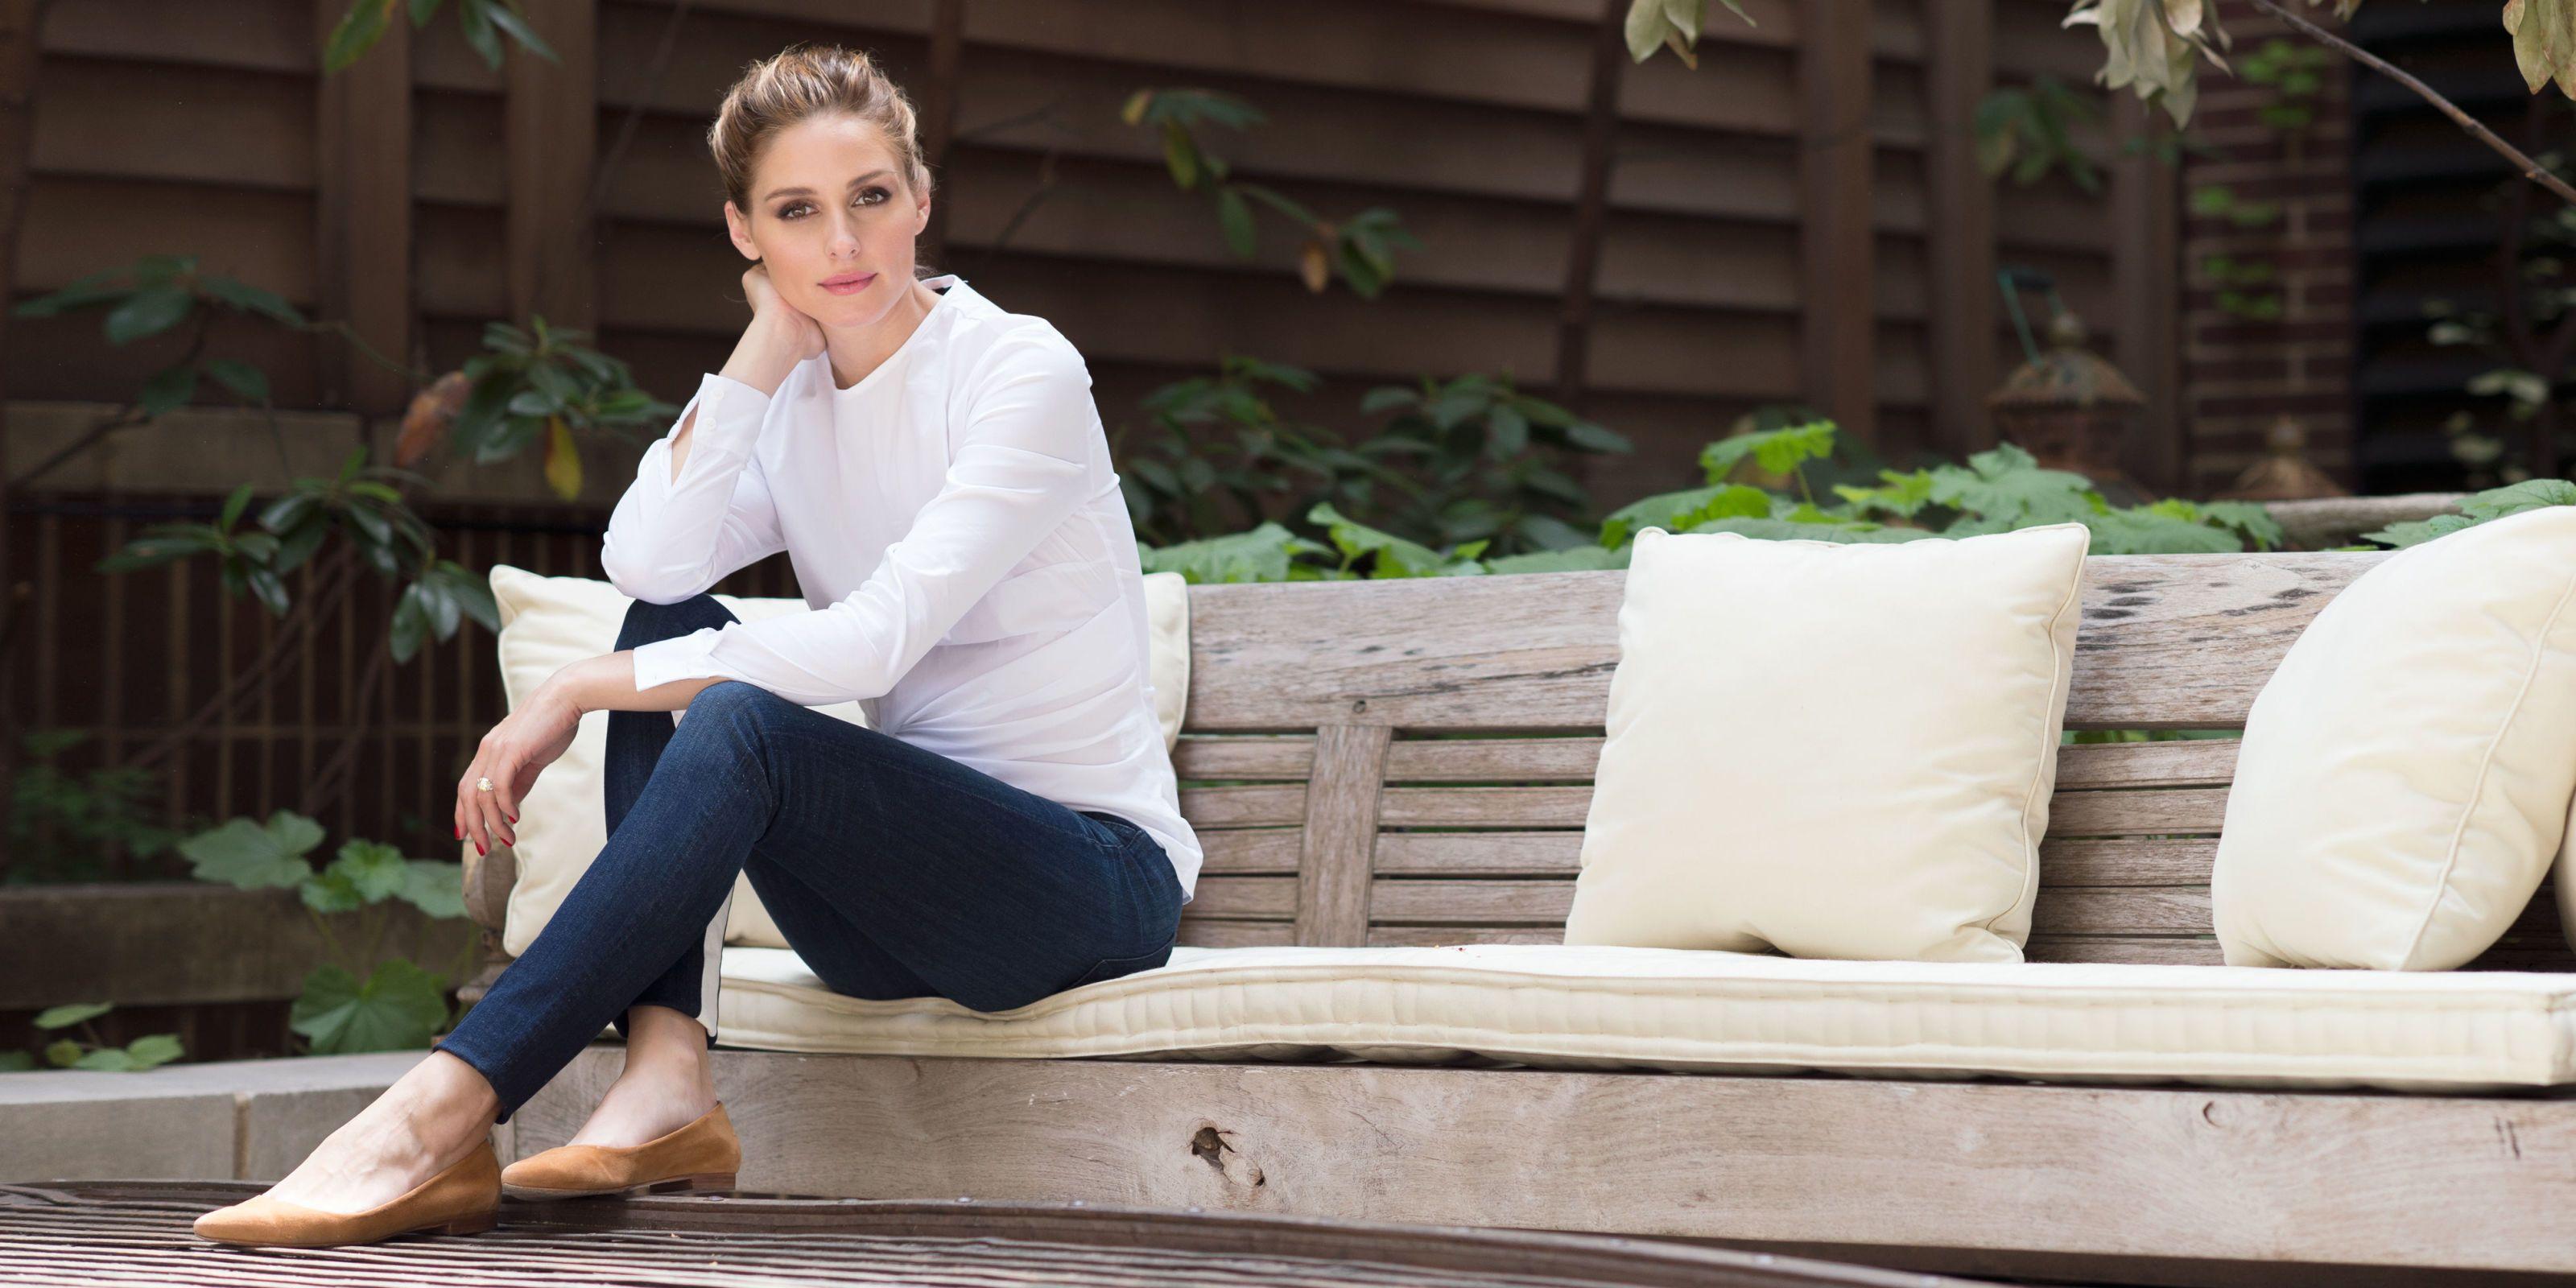 6 Beauty Secrets I Learned From Olivia Palermo